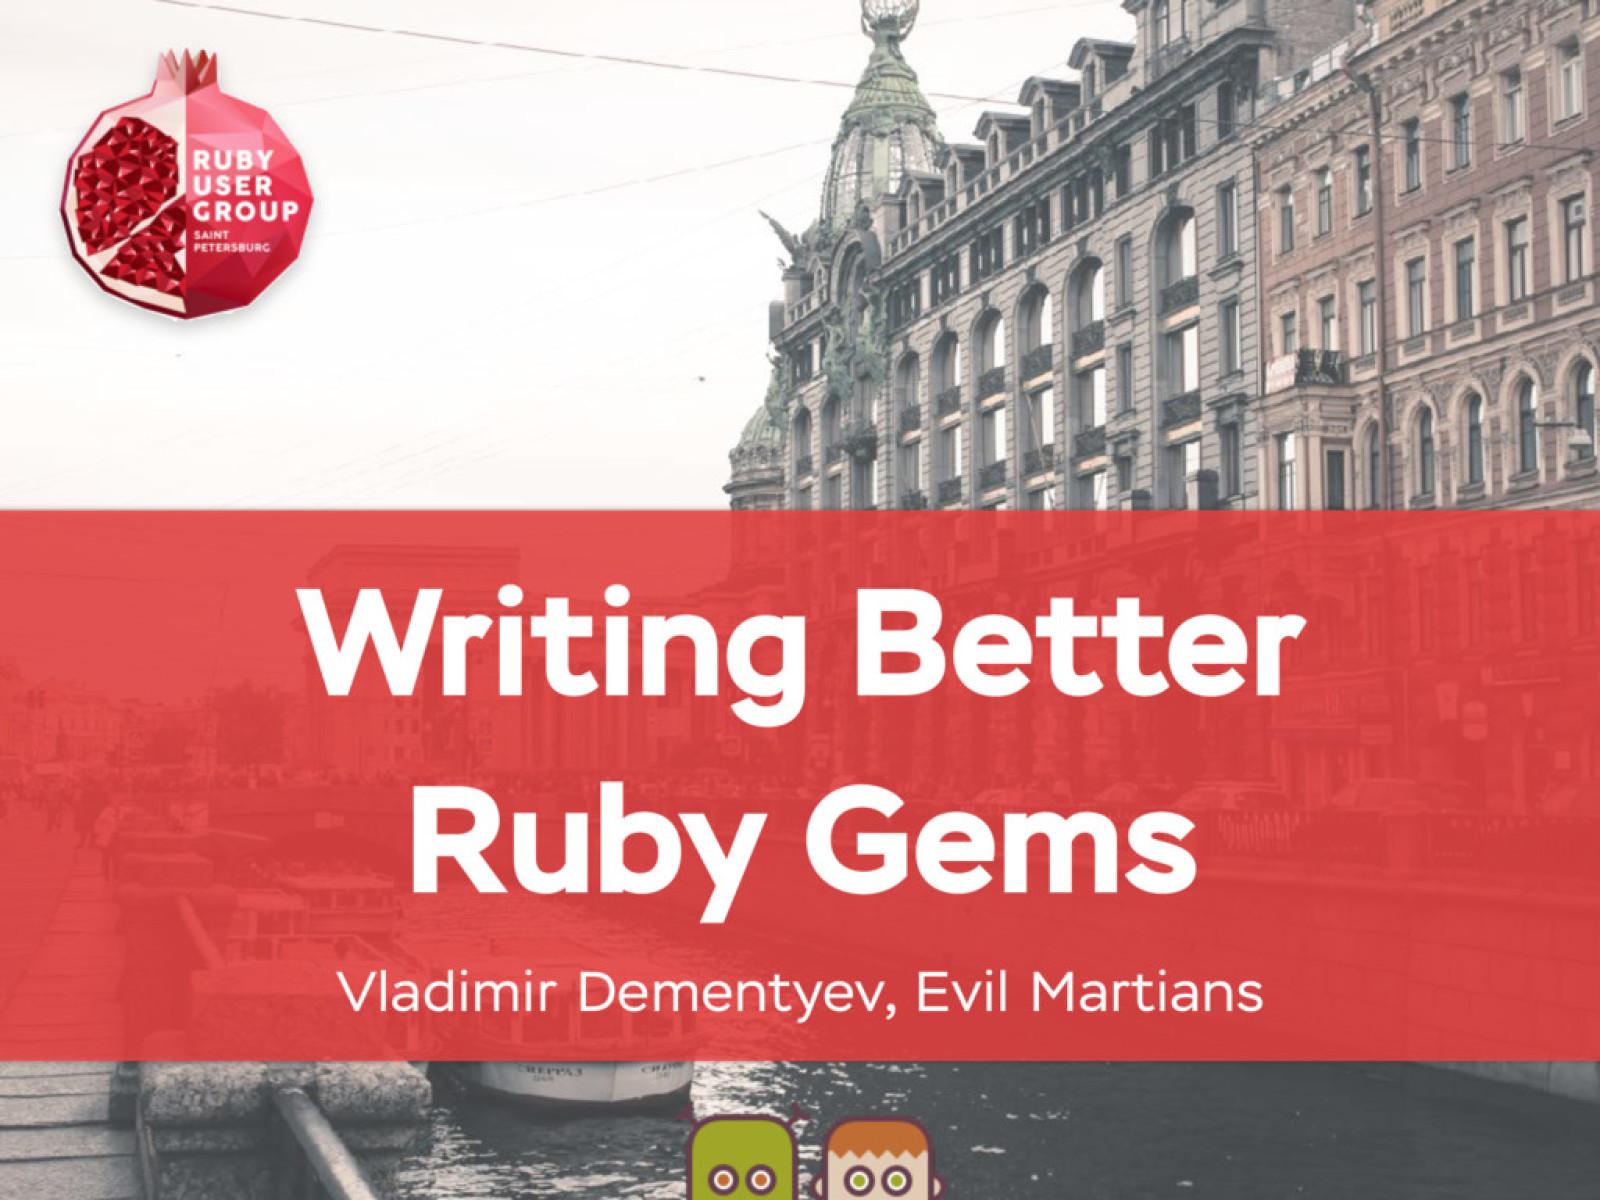 Writing better Rubygems